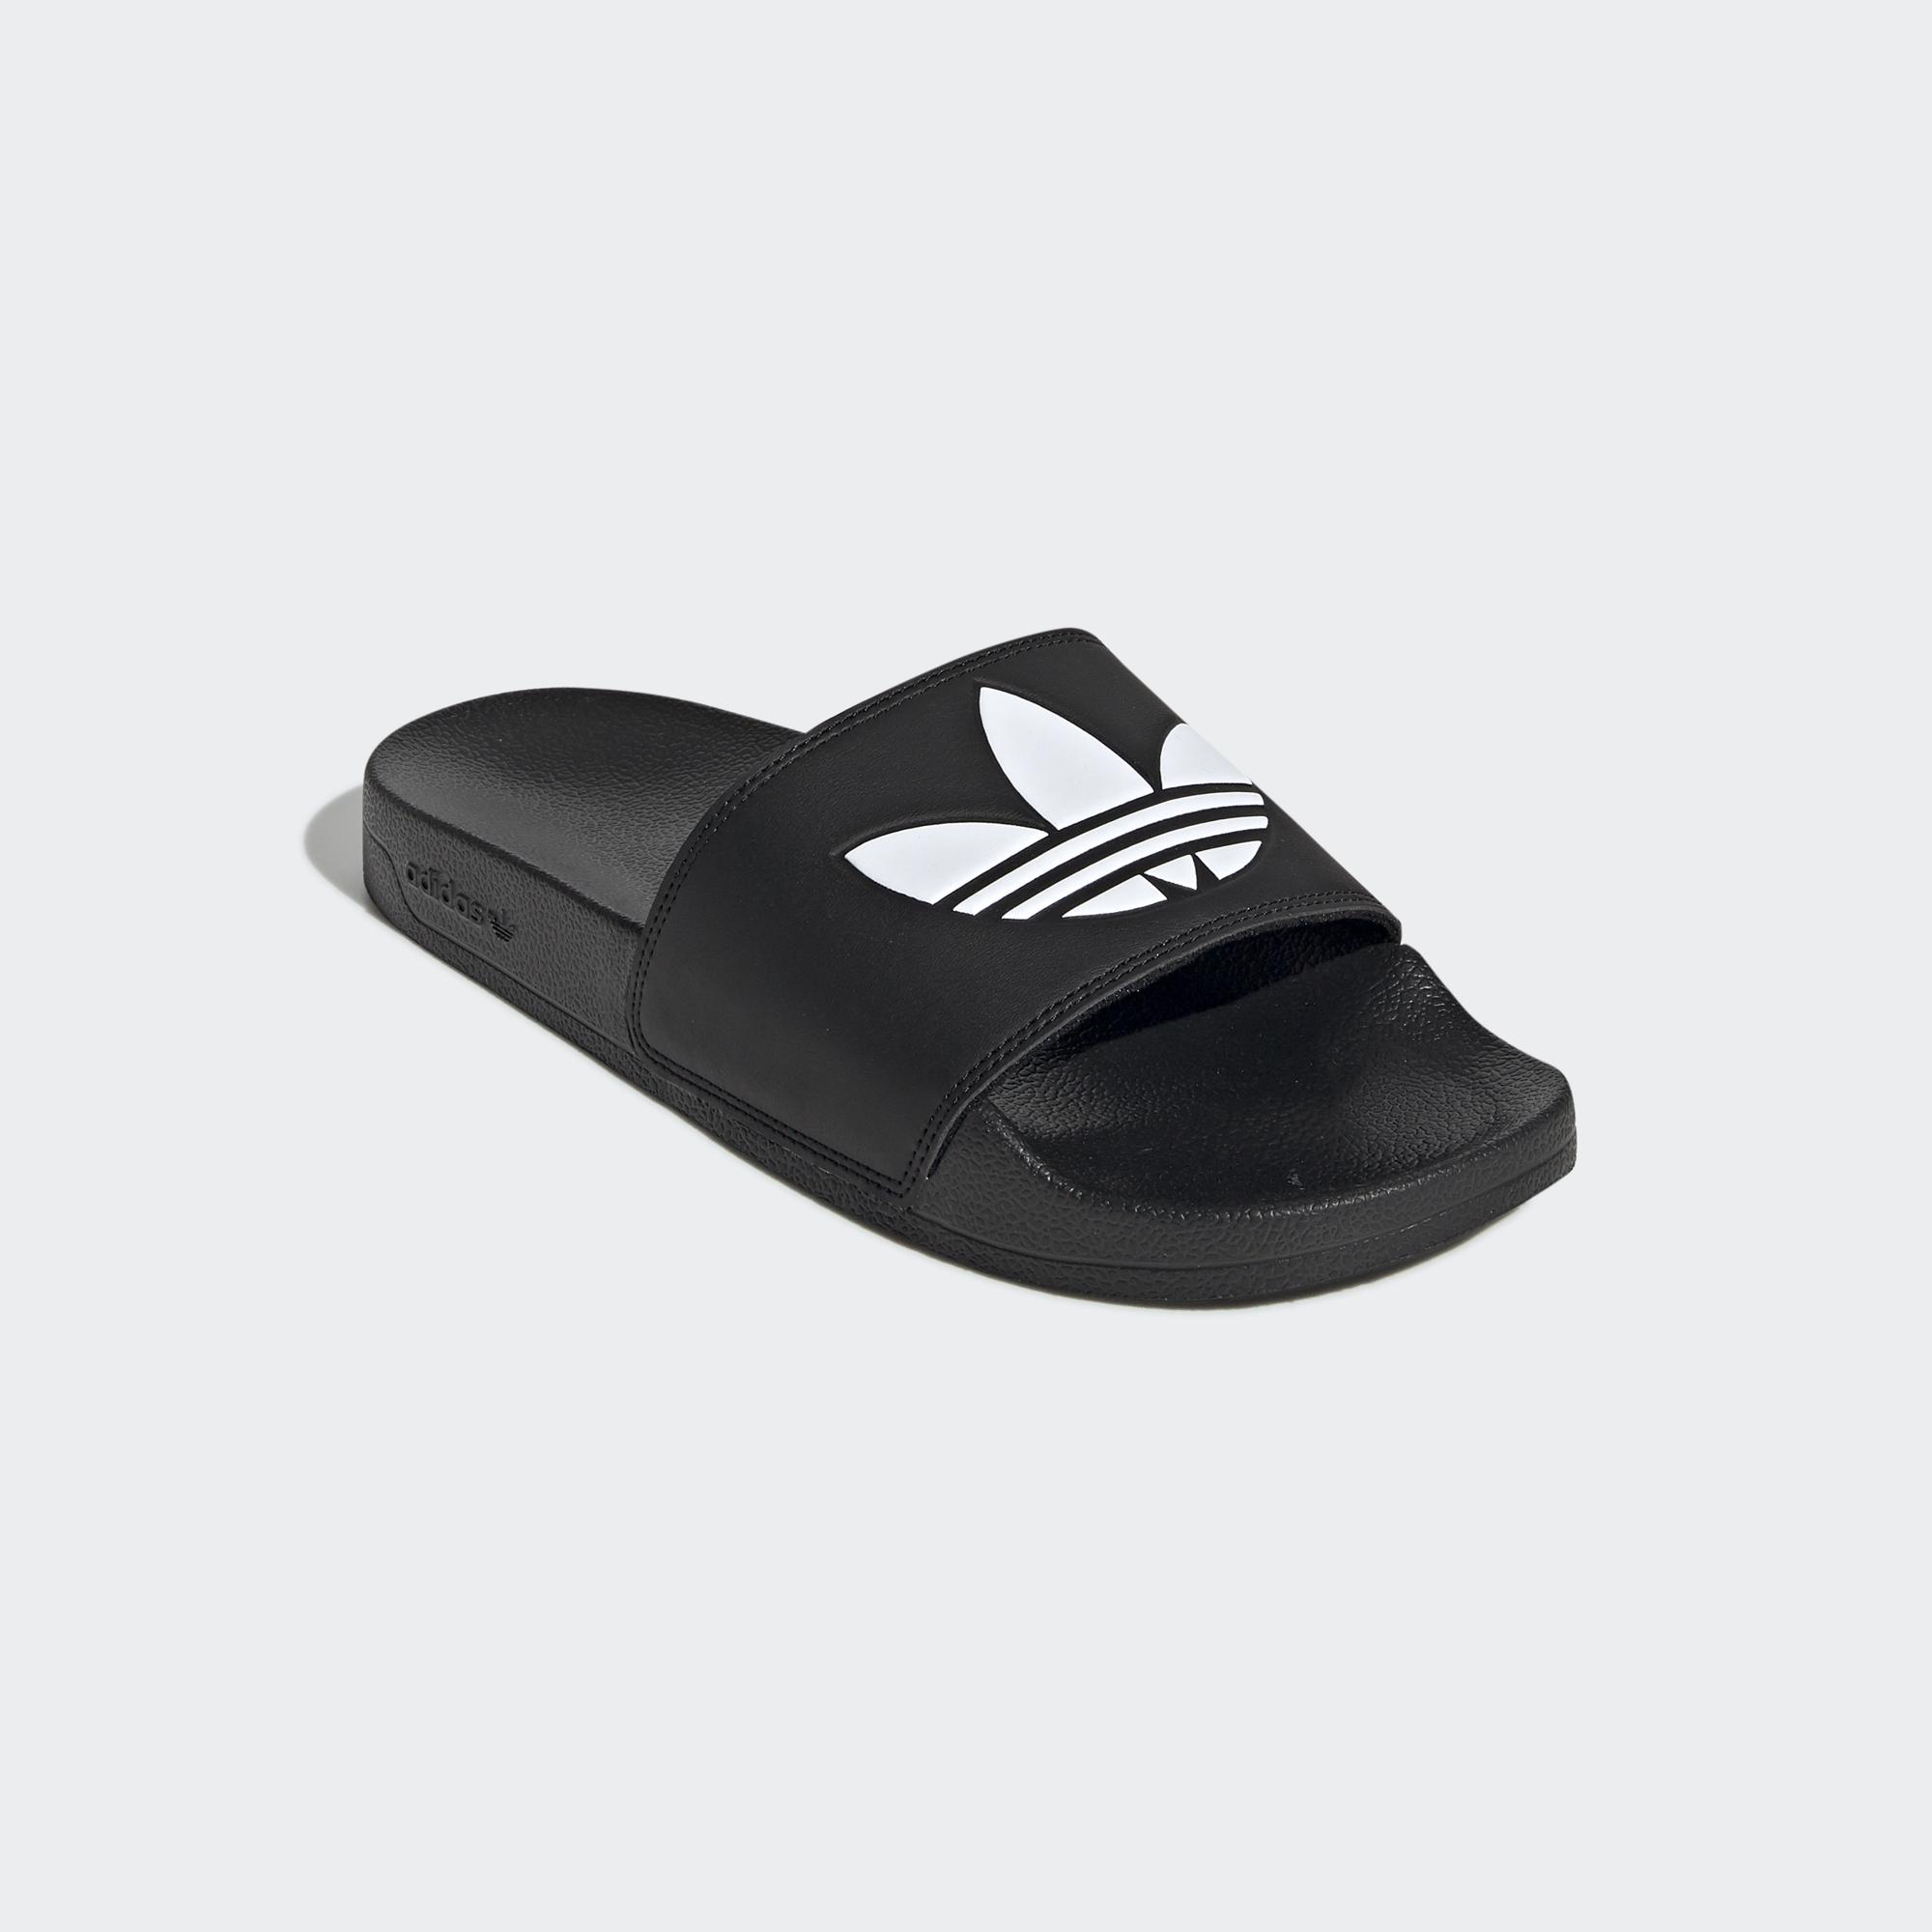 Adilette Lite 運動拖鞋